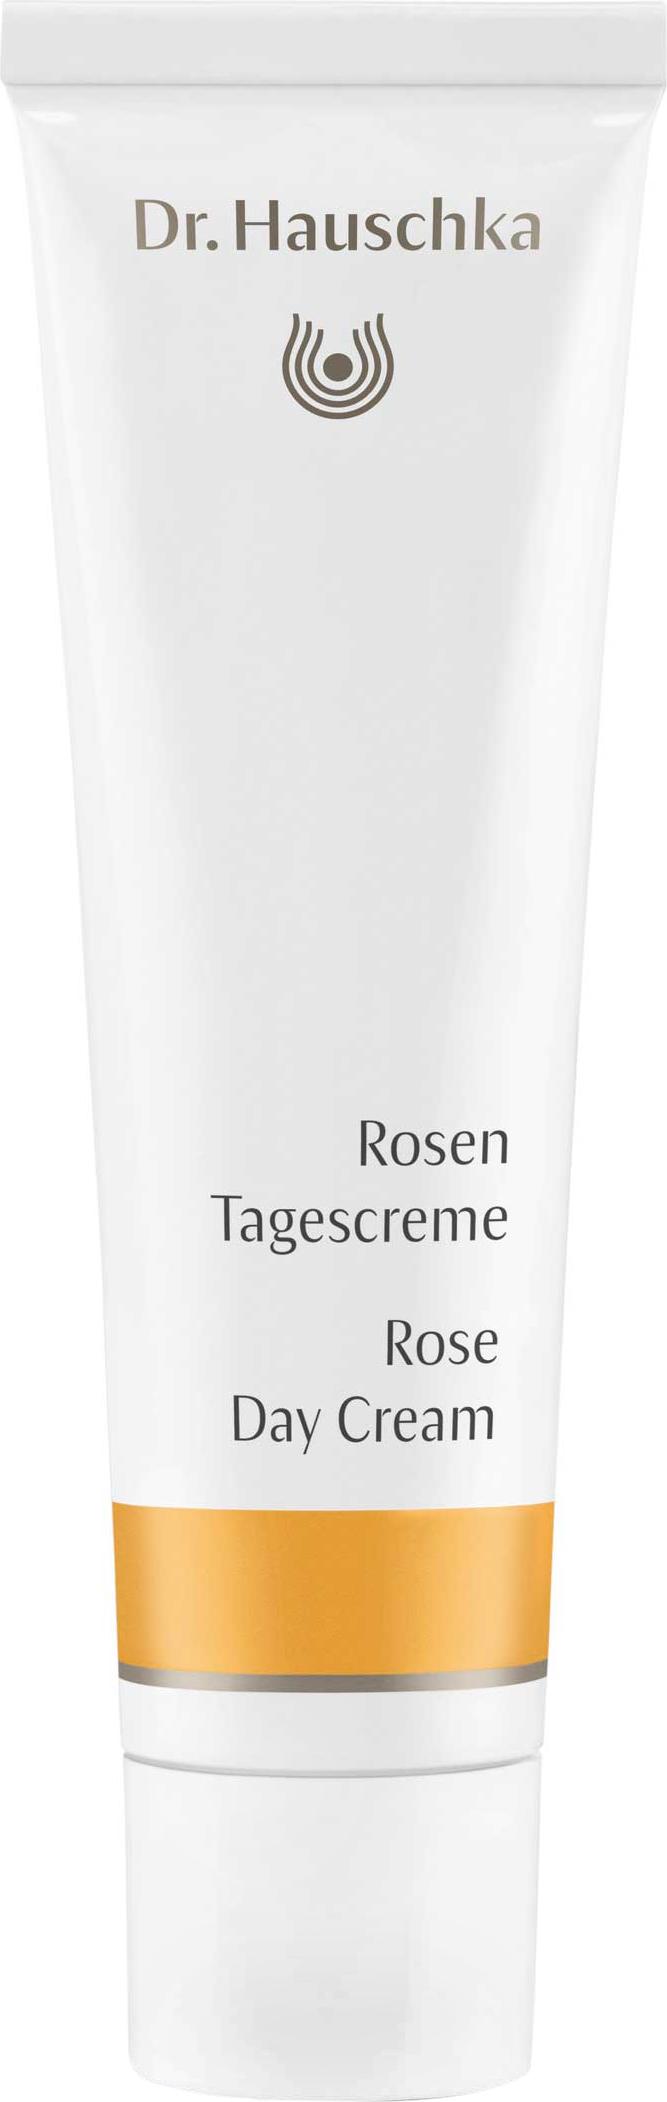 Dr. Hauschka Daycream Rose